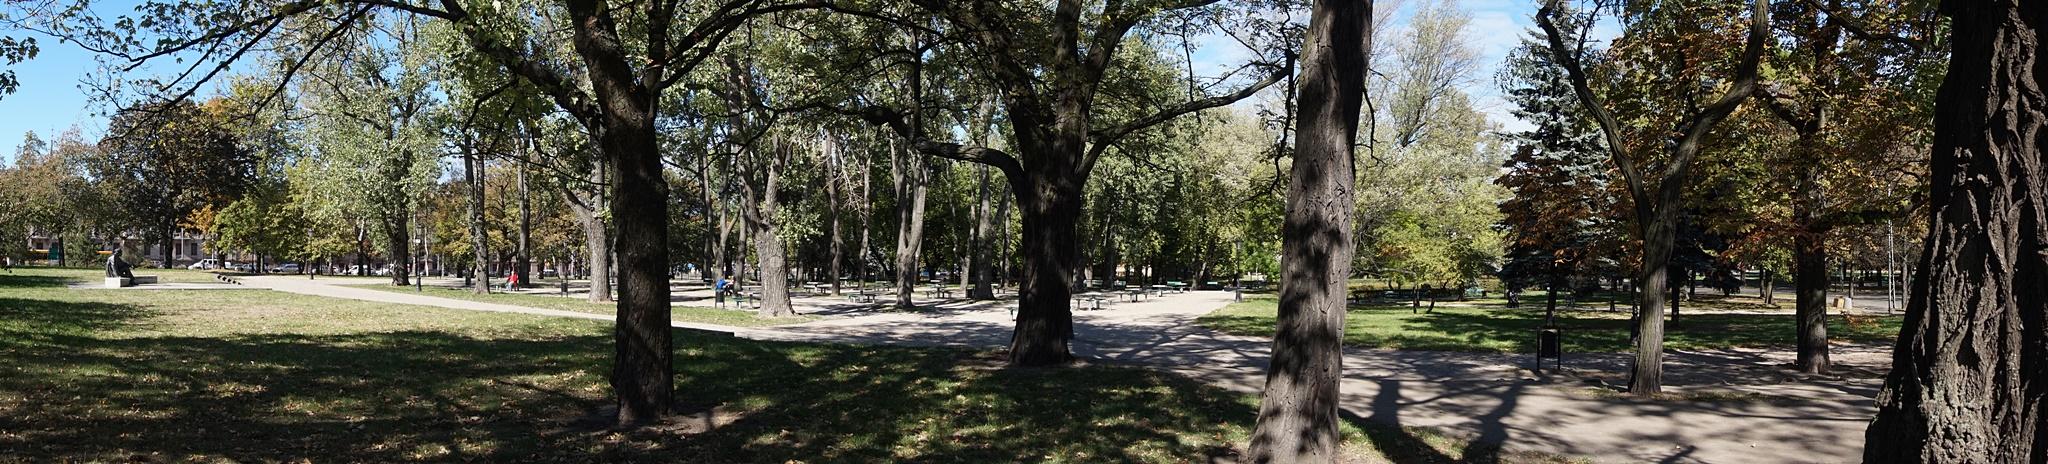 Park Staromiejski 2